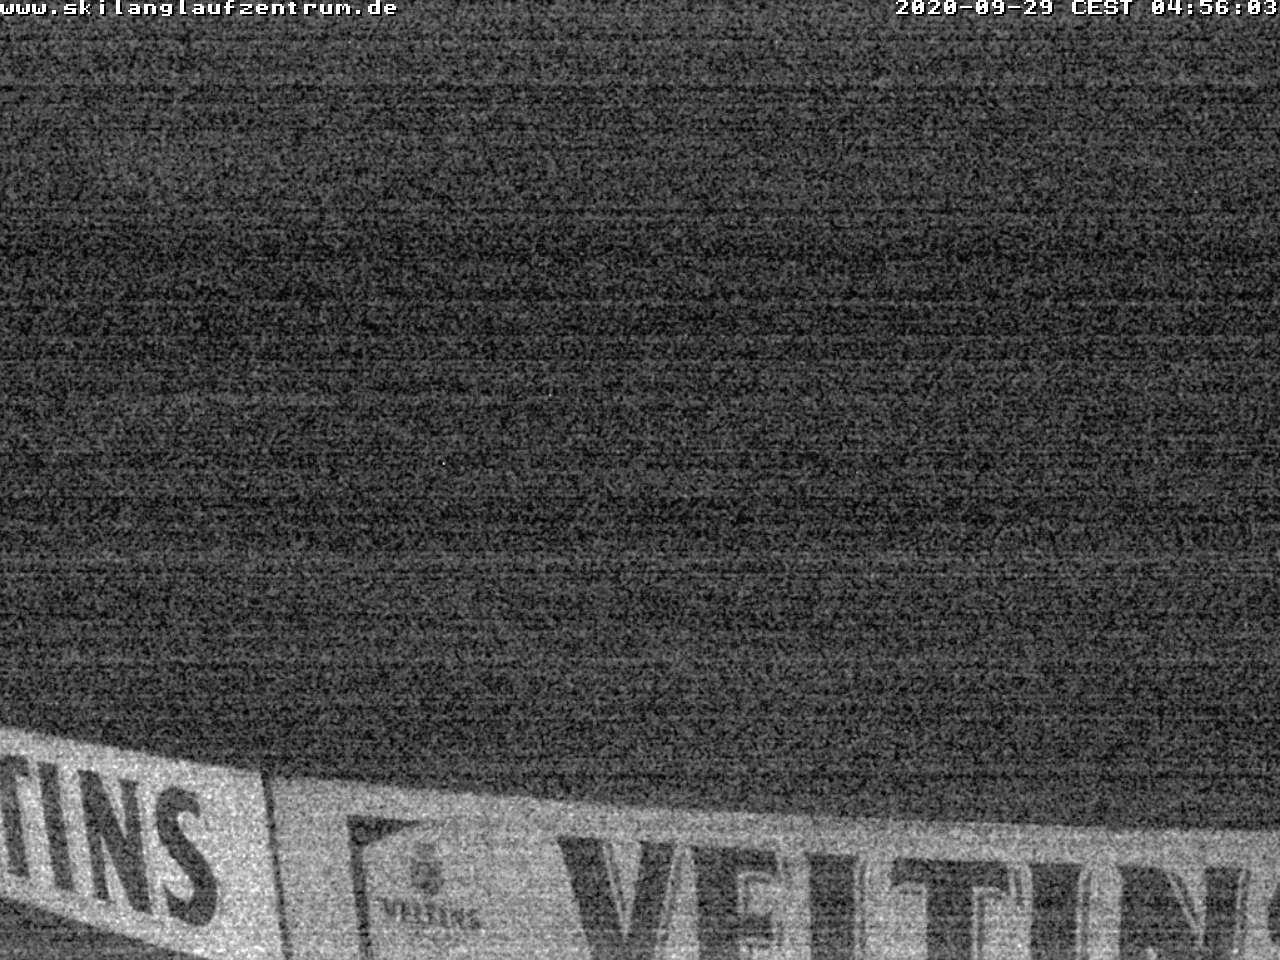 Skilanglaufzentrum Hochsauerland Westfeld/Ohlenbach/Nordenau - Webcam 1